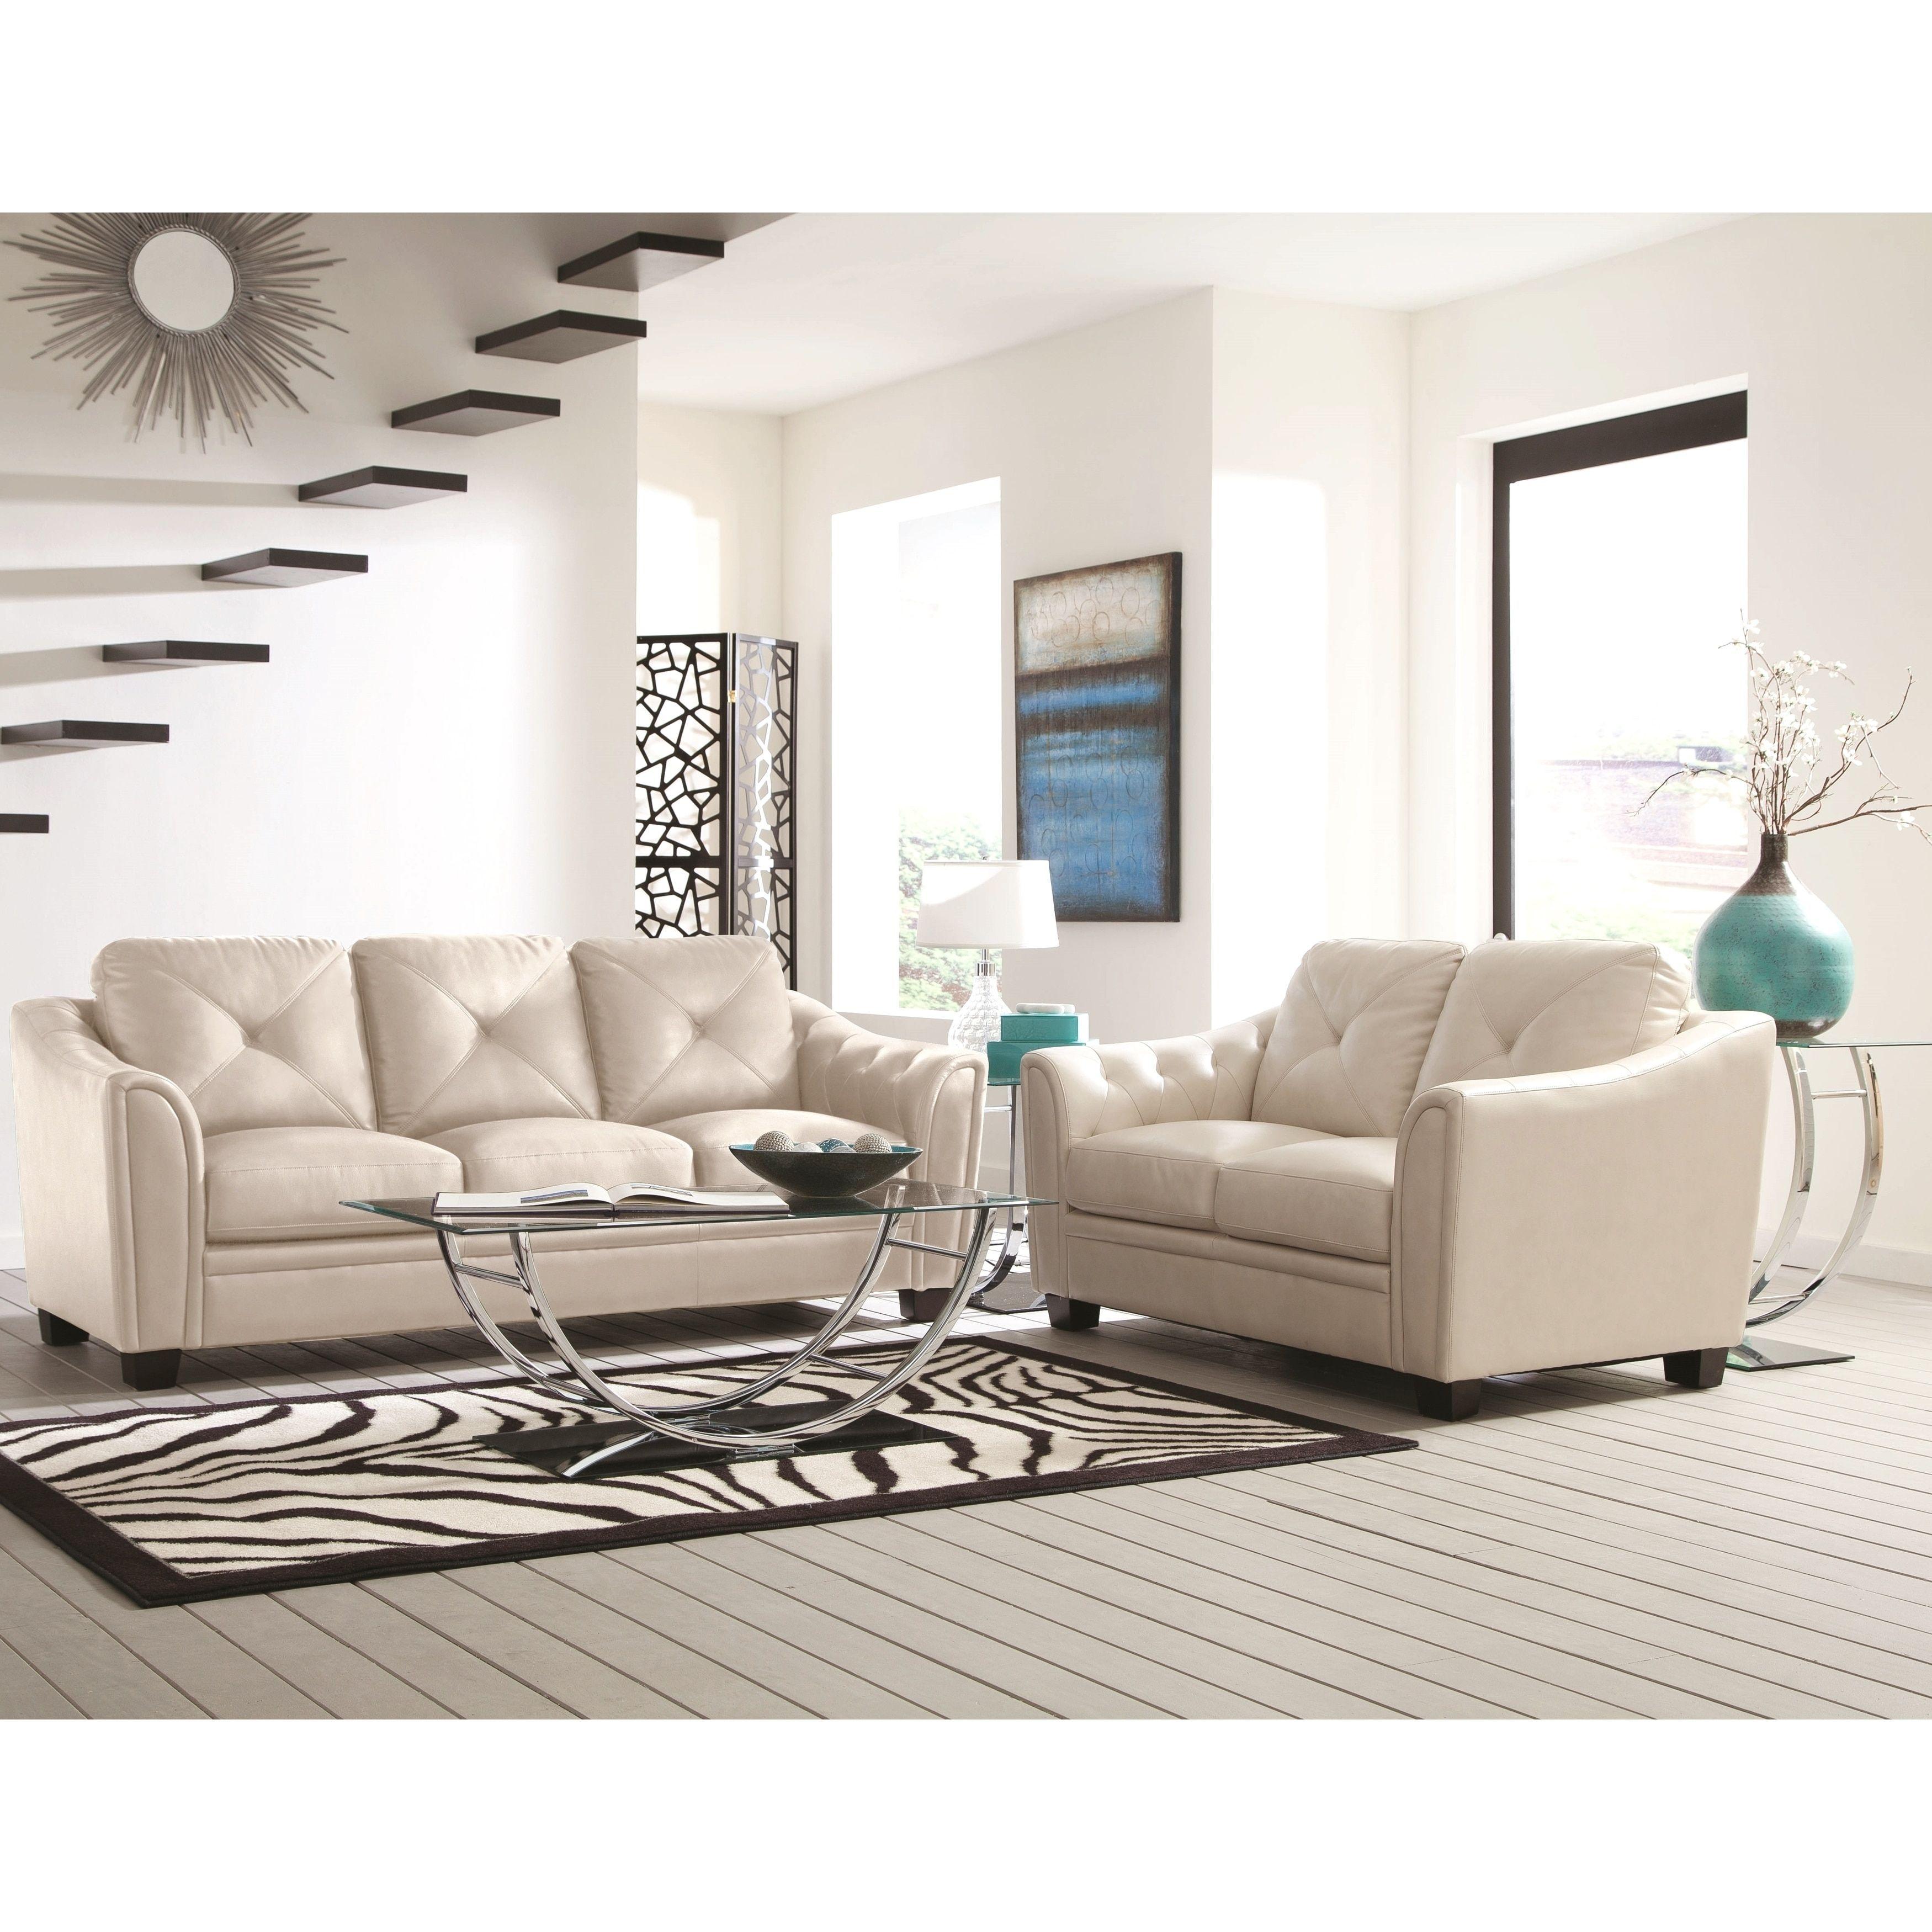 lacasta mid century modern tufted design cream ivory living room